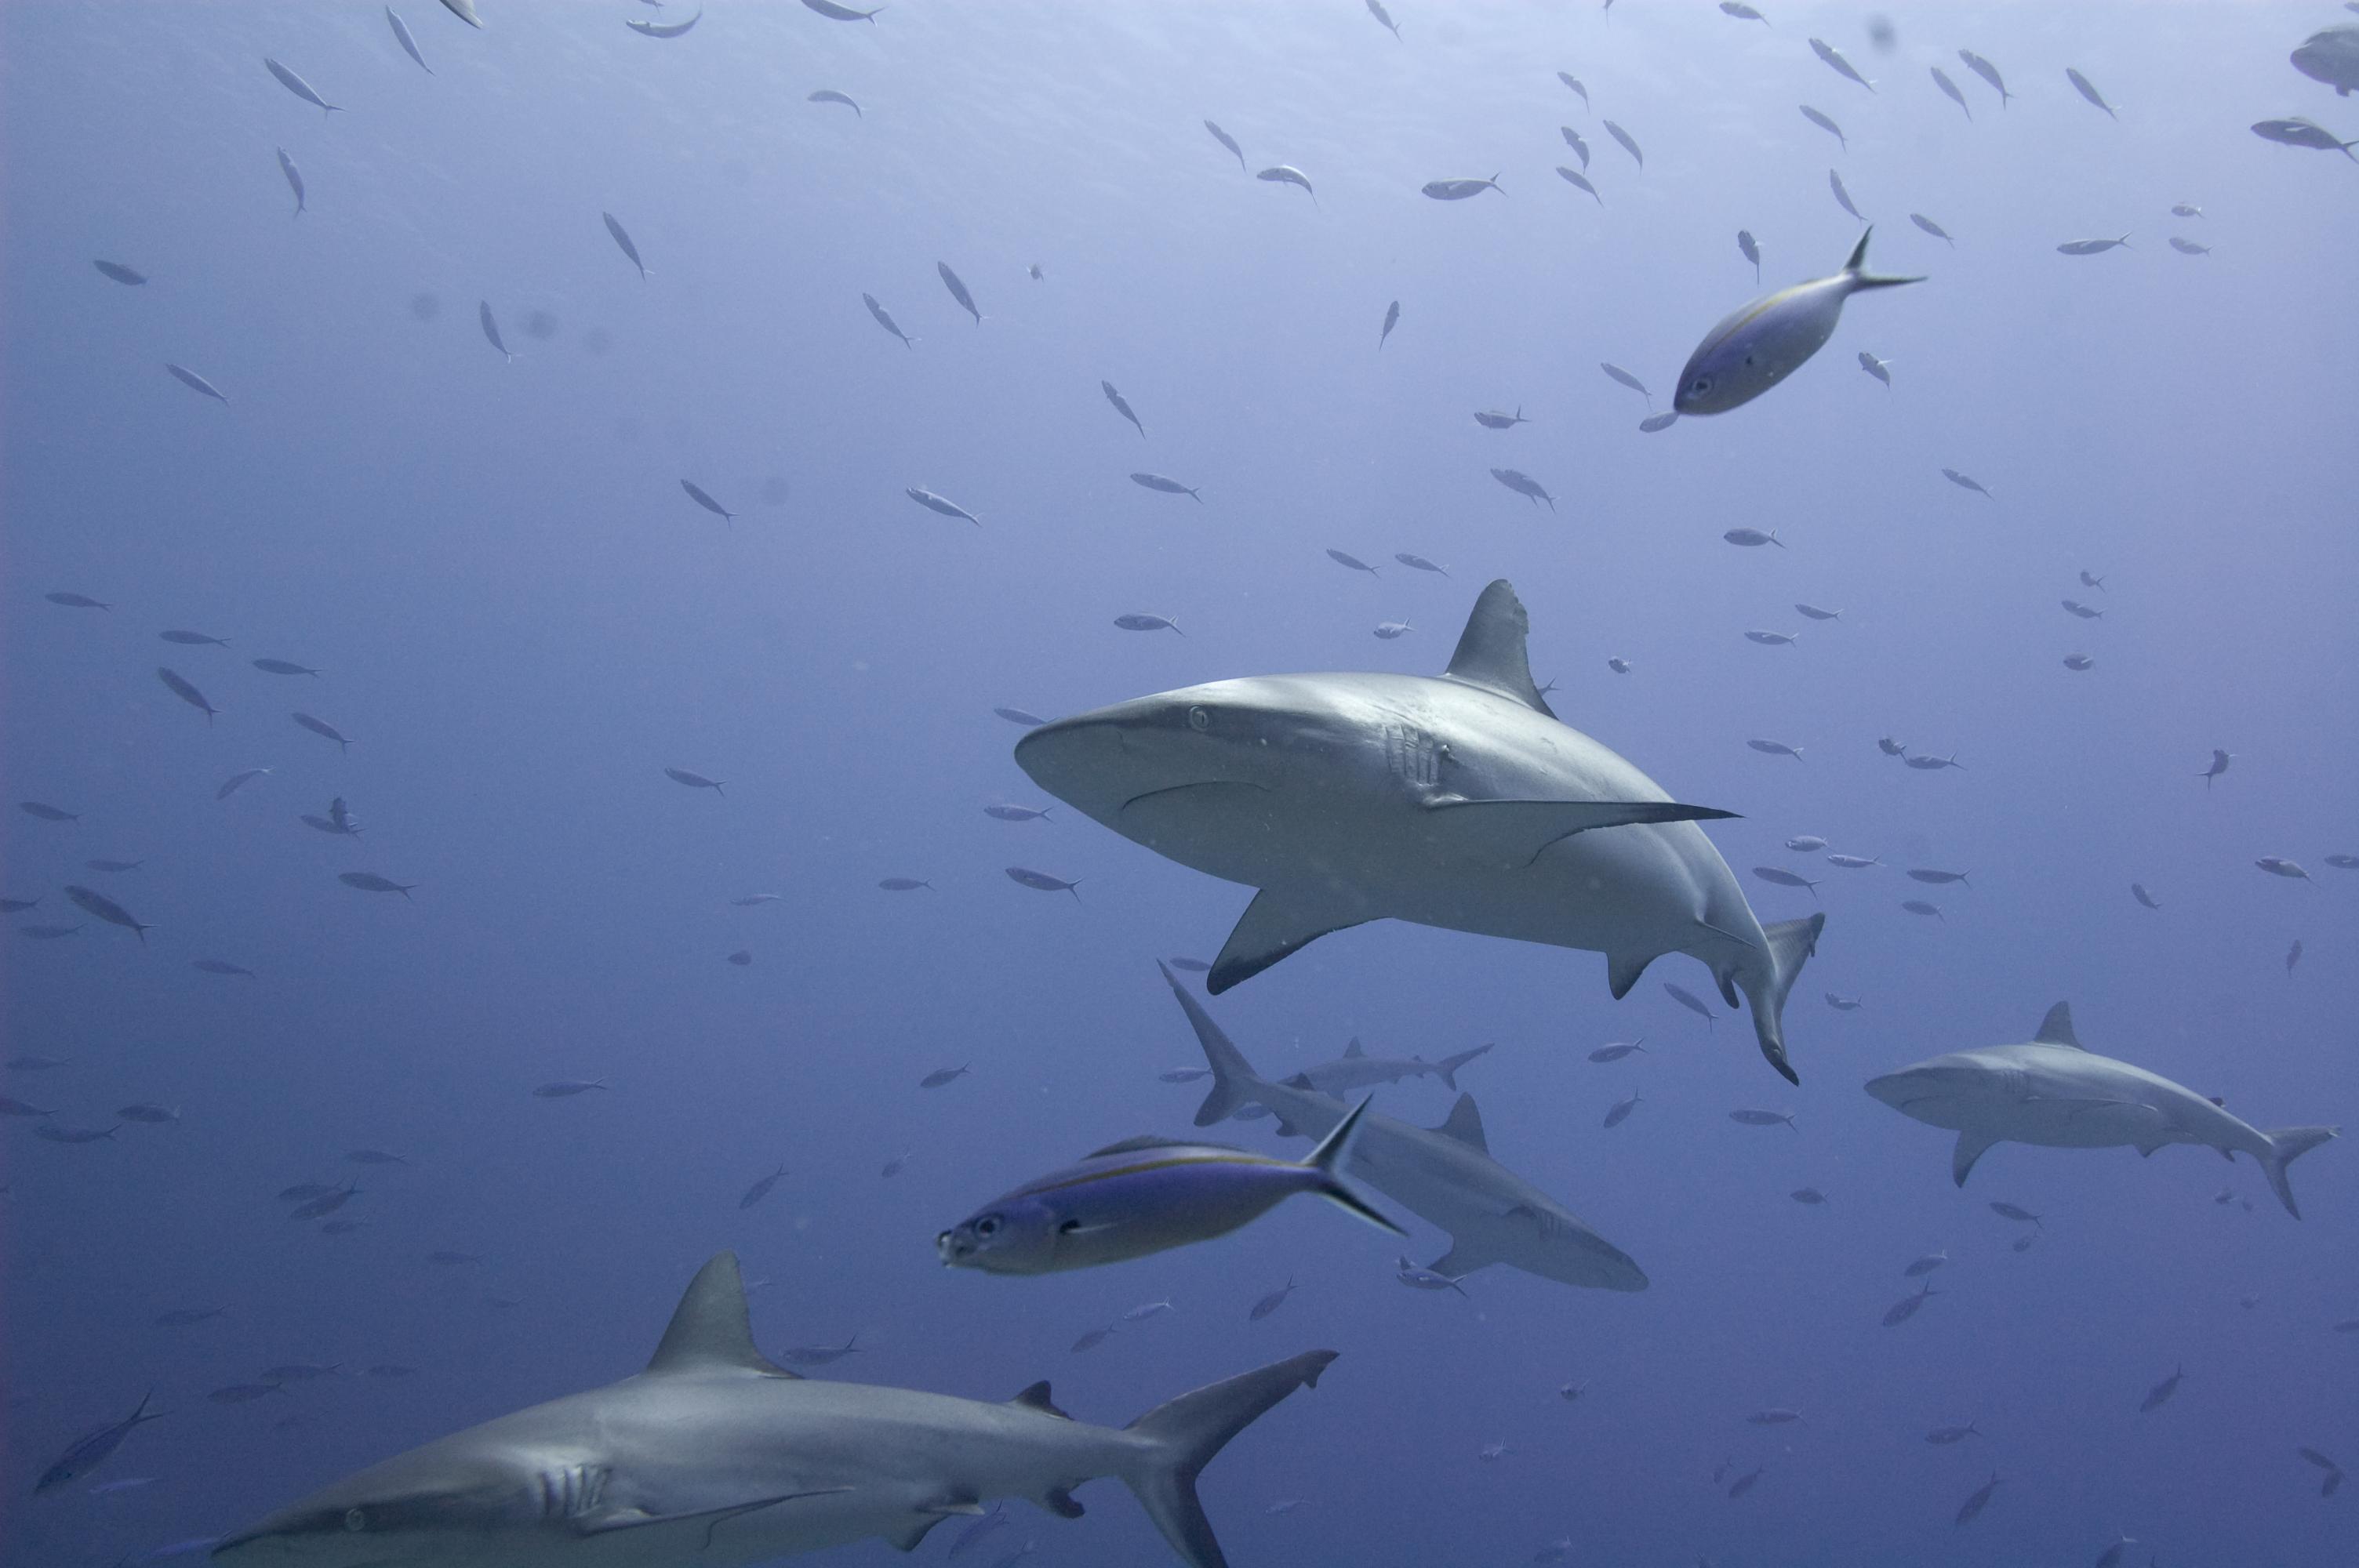 Sharks 1, Con2011, Fiji, Shark, Underwater, HQ Photo